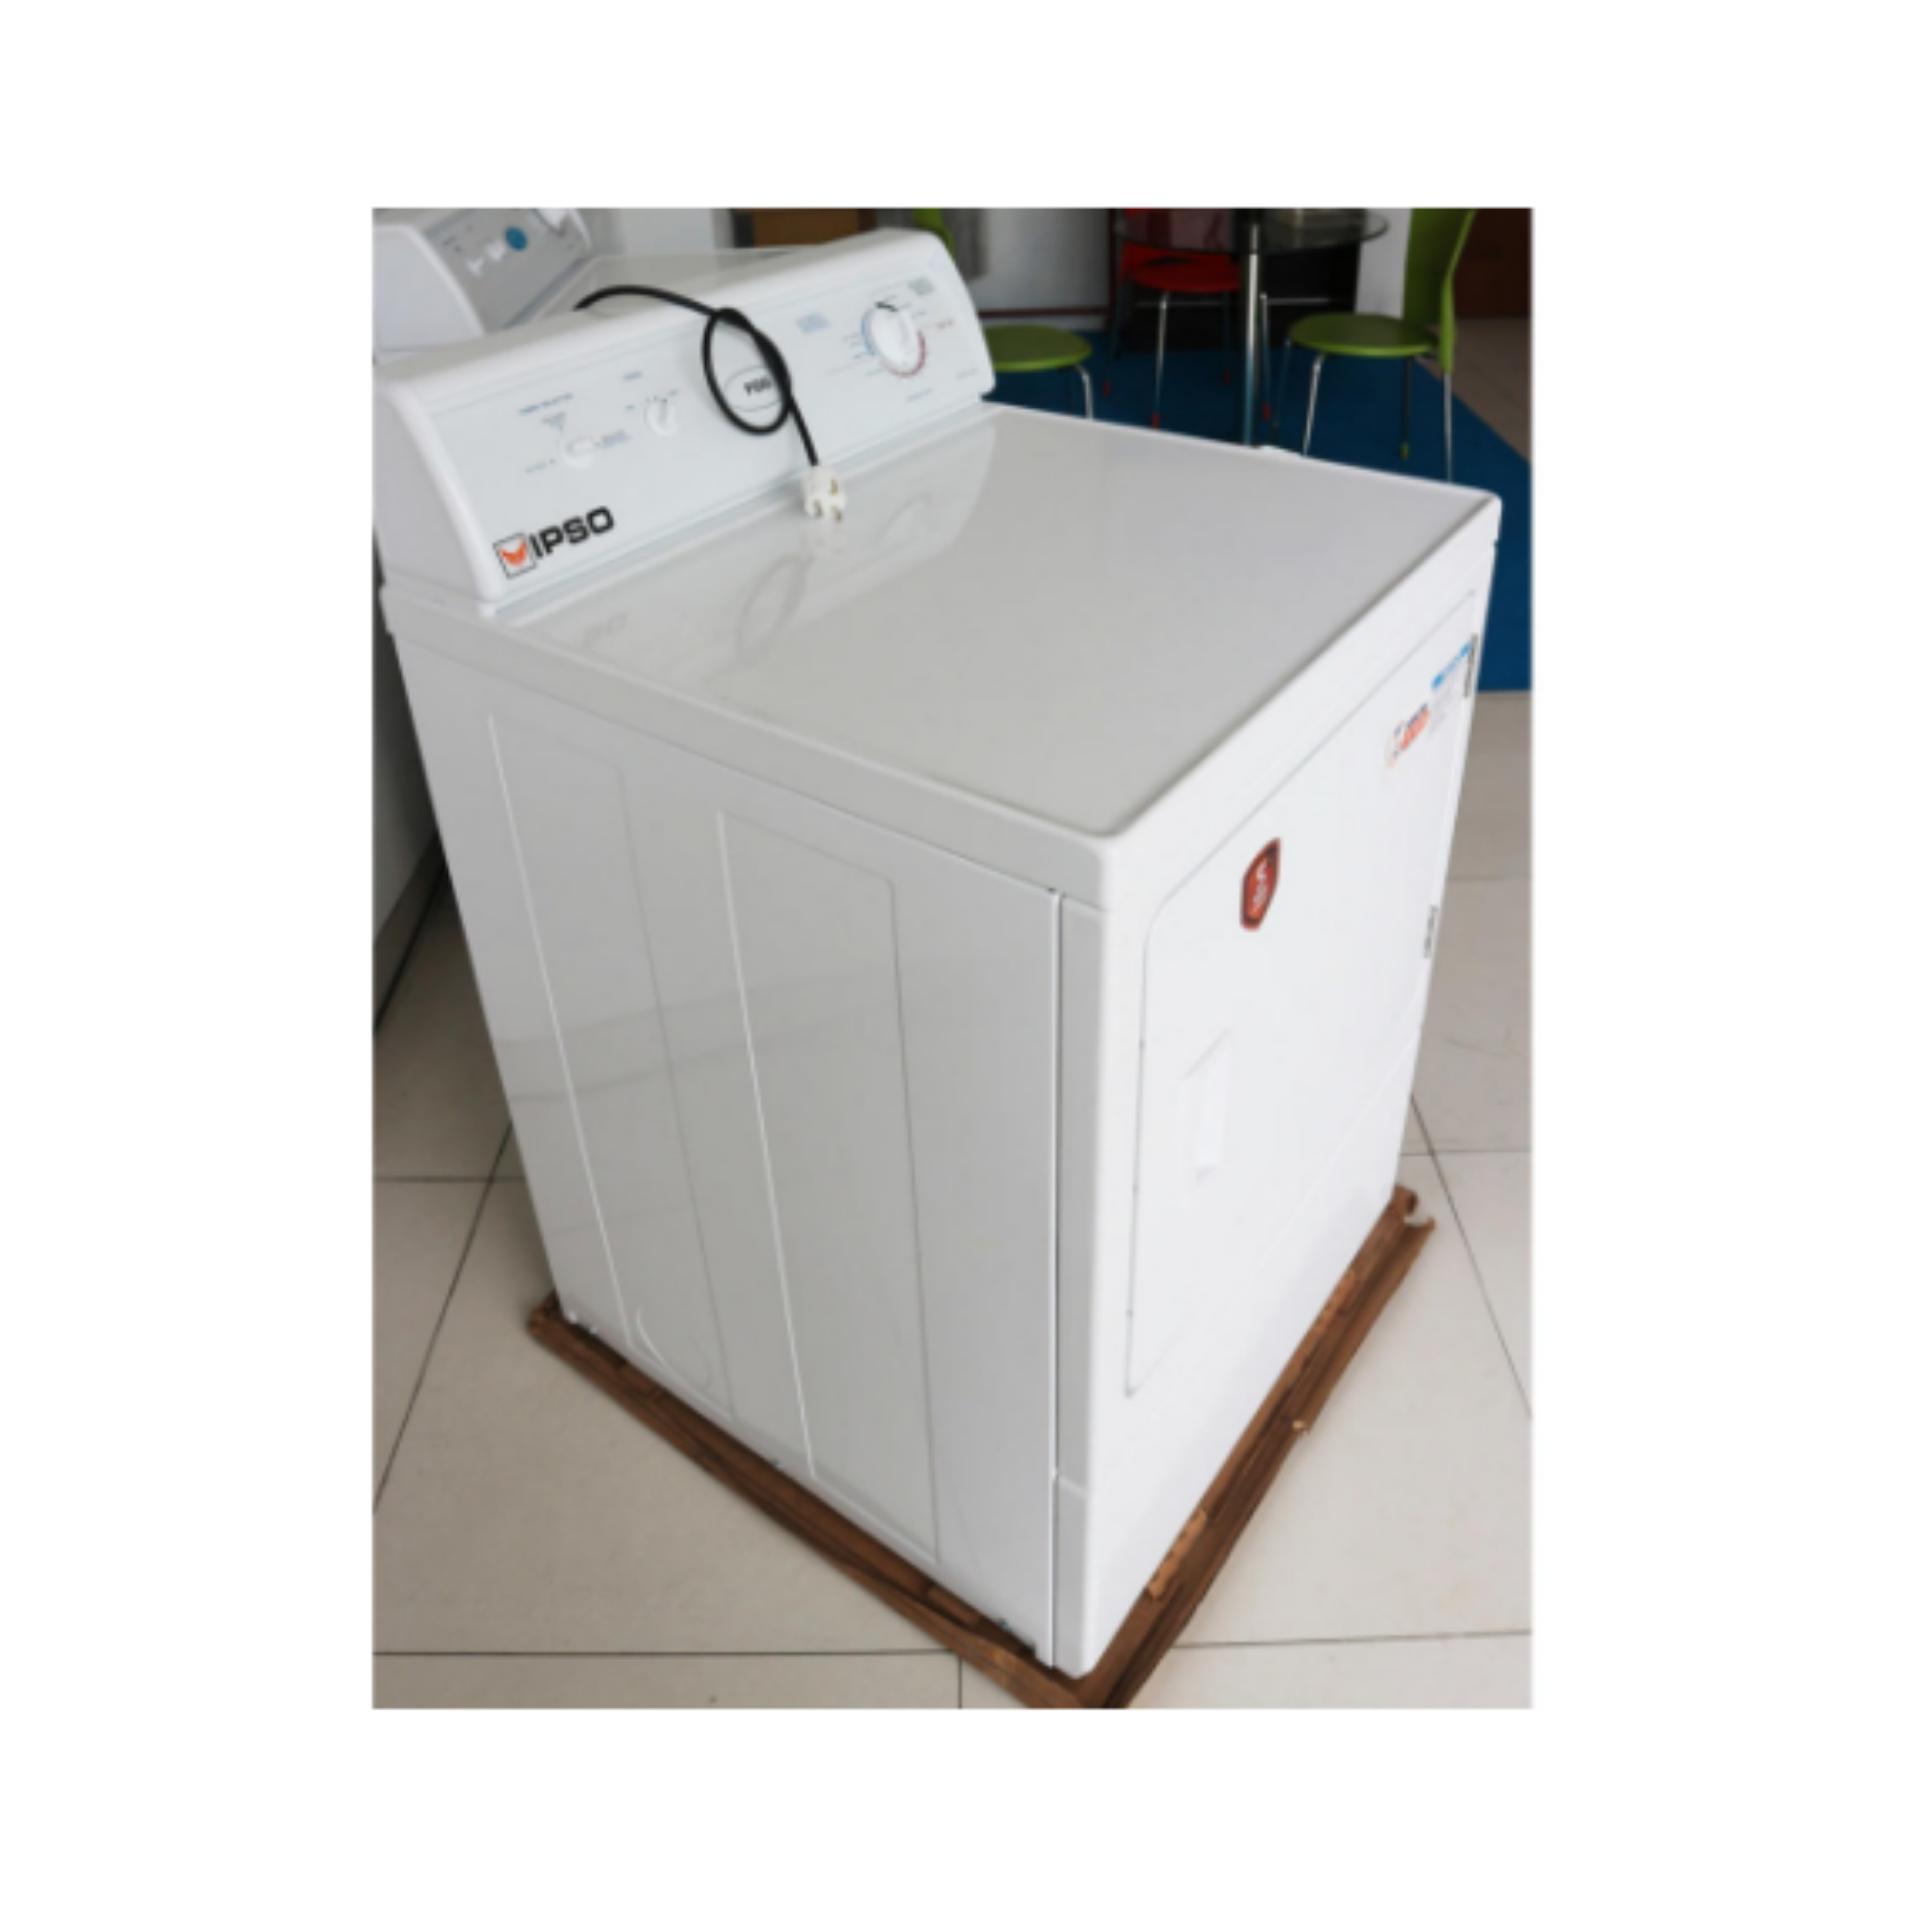 Ipso Mesin Pengering Fdg 105 Kg Putih Harga Terkini Dan Terlengkap Lg Wd P1411d6 10kg Hitam 100 Kering Cuci Front Loanding 1400rpm Khusus Jabodetabek Dryer Gas Fdg3t